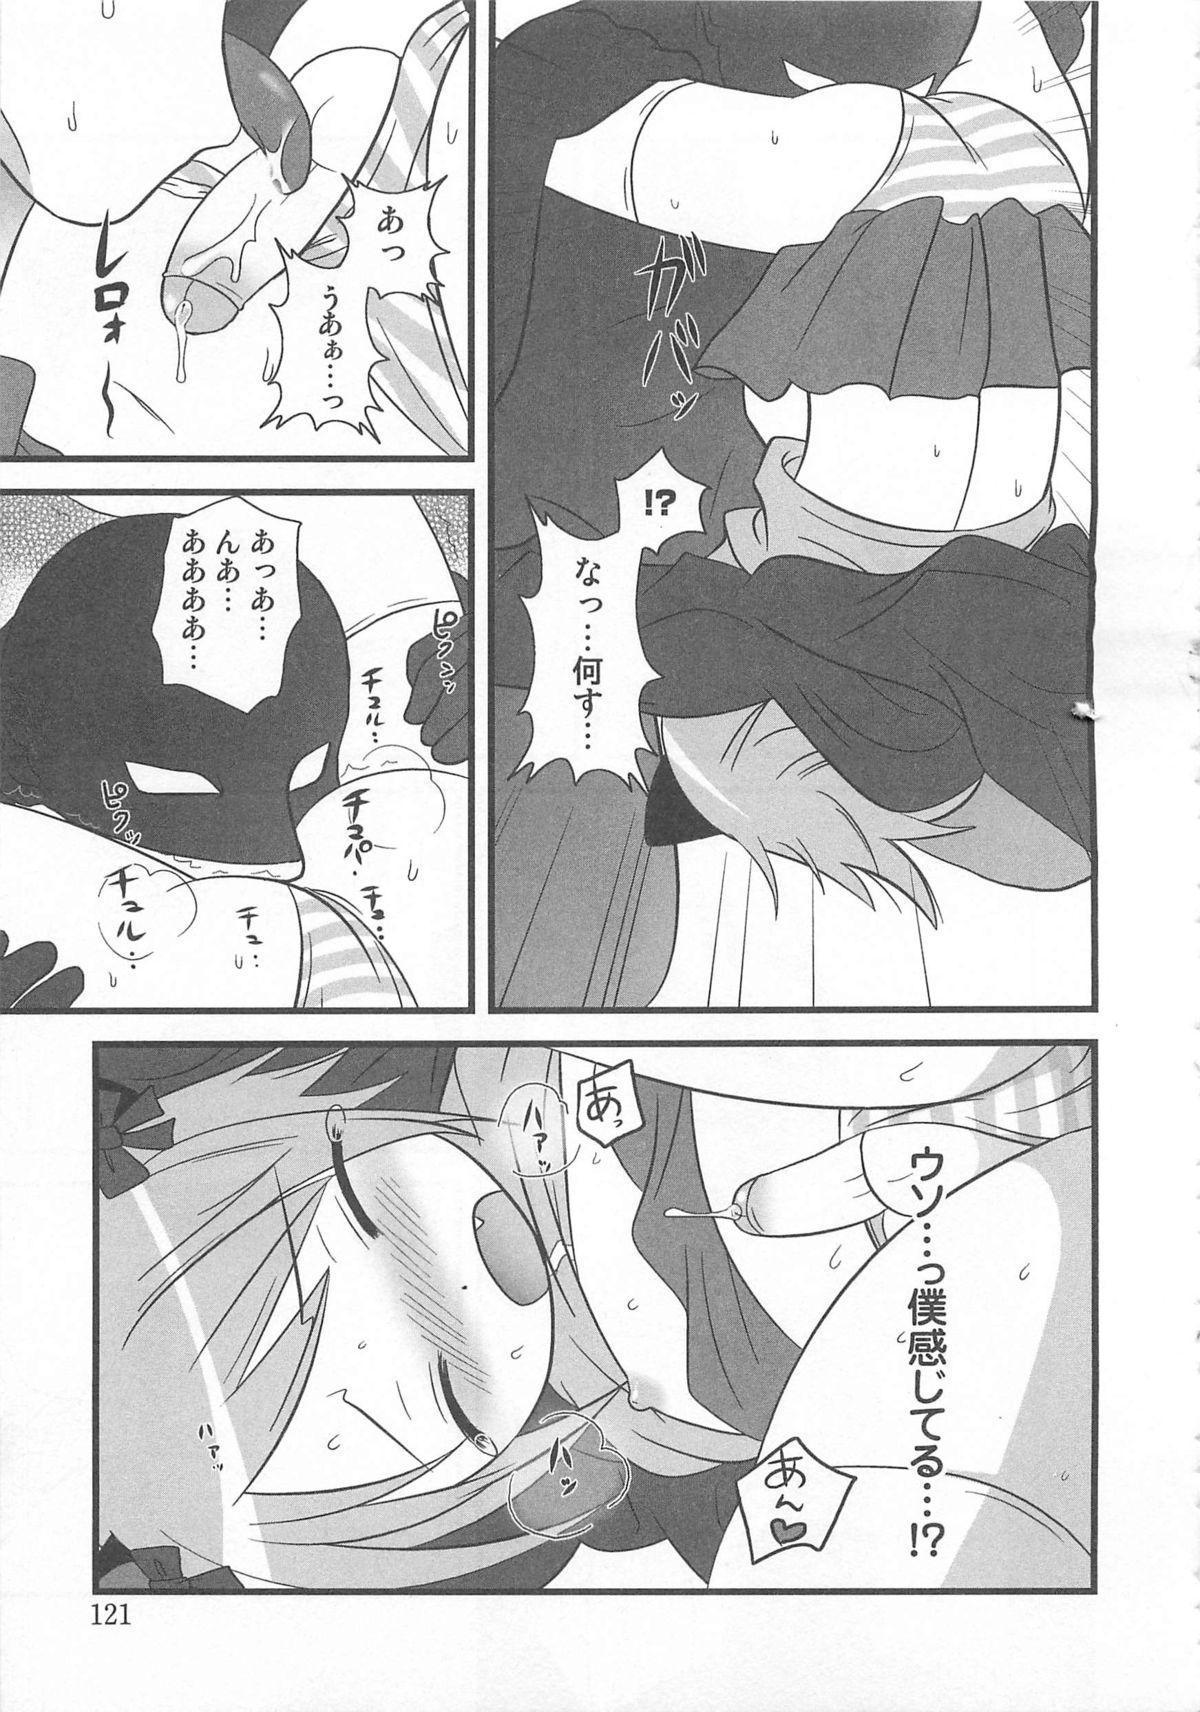 Otokonoko HEAVEN Vol. 02 Dokidoki Chikan Taiken 123